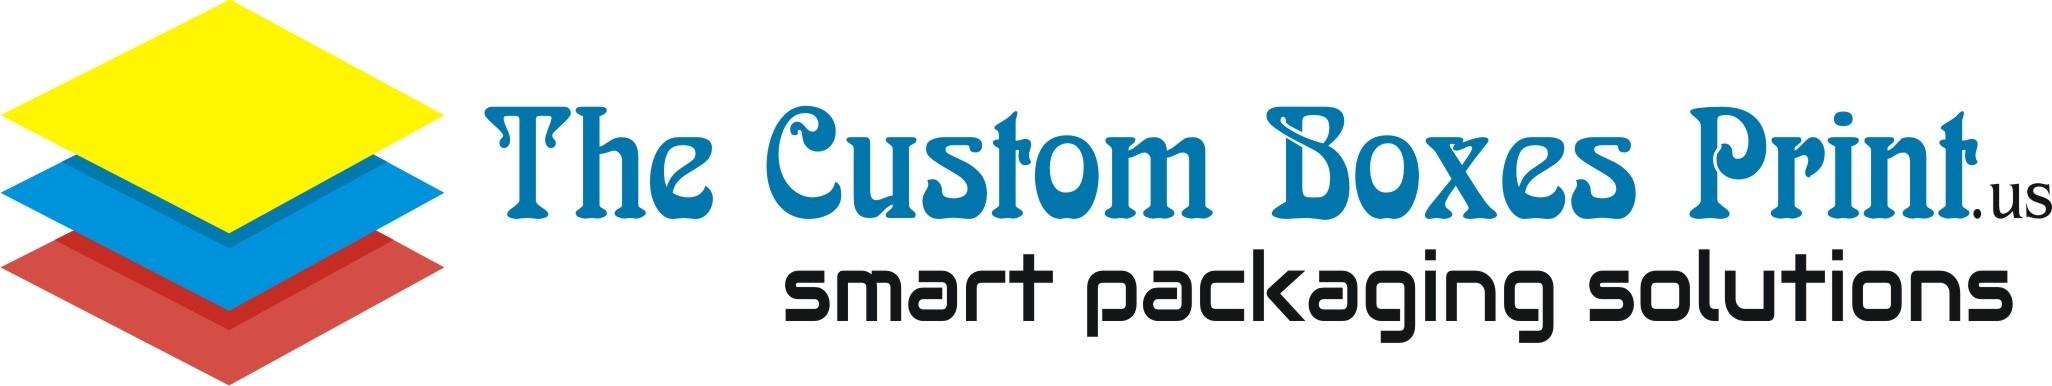 The Custom Boxes Prin (@sofia5334) Cover Image